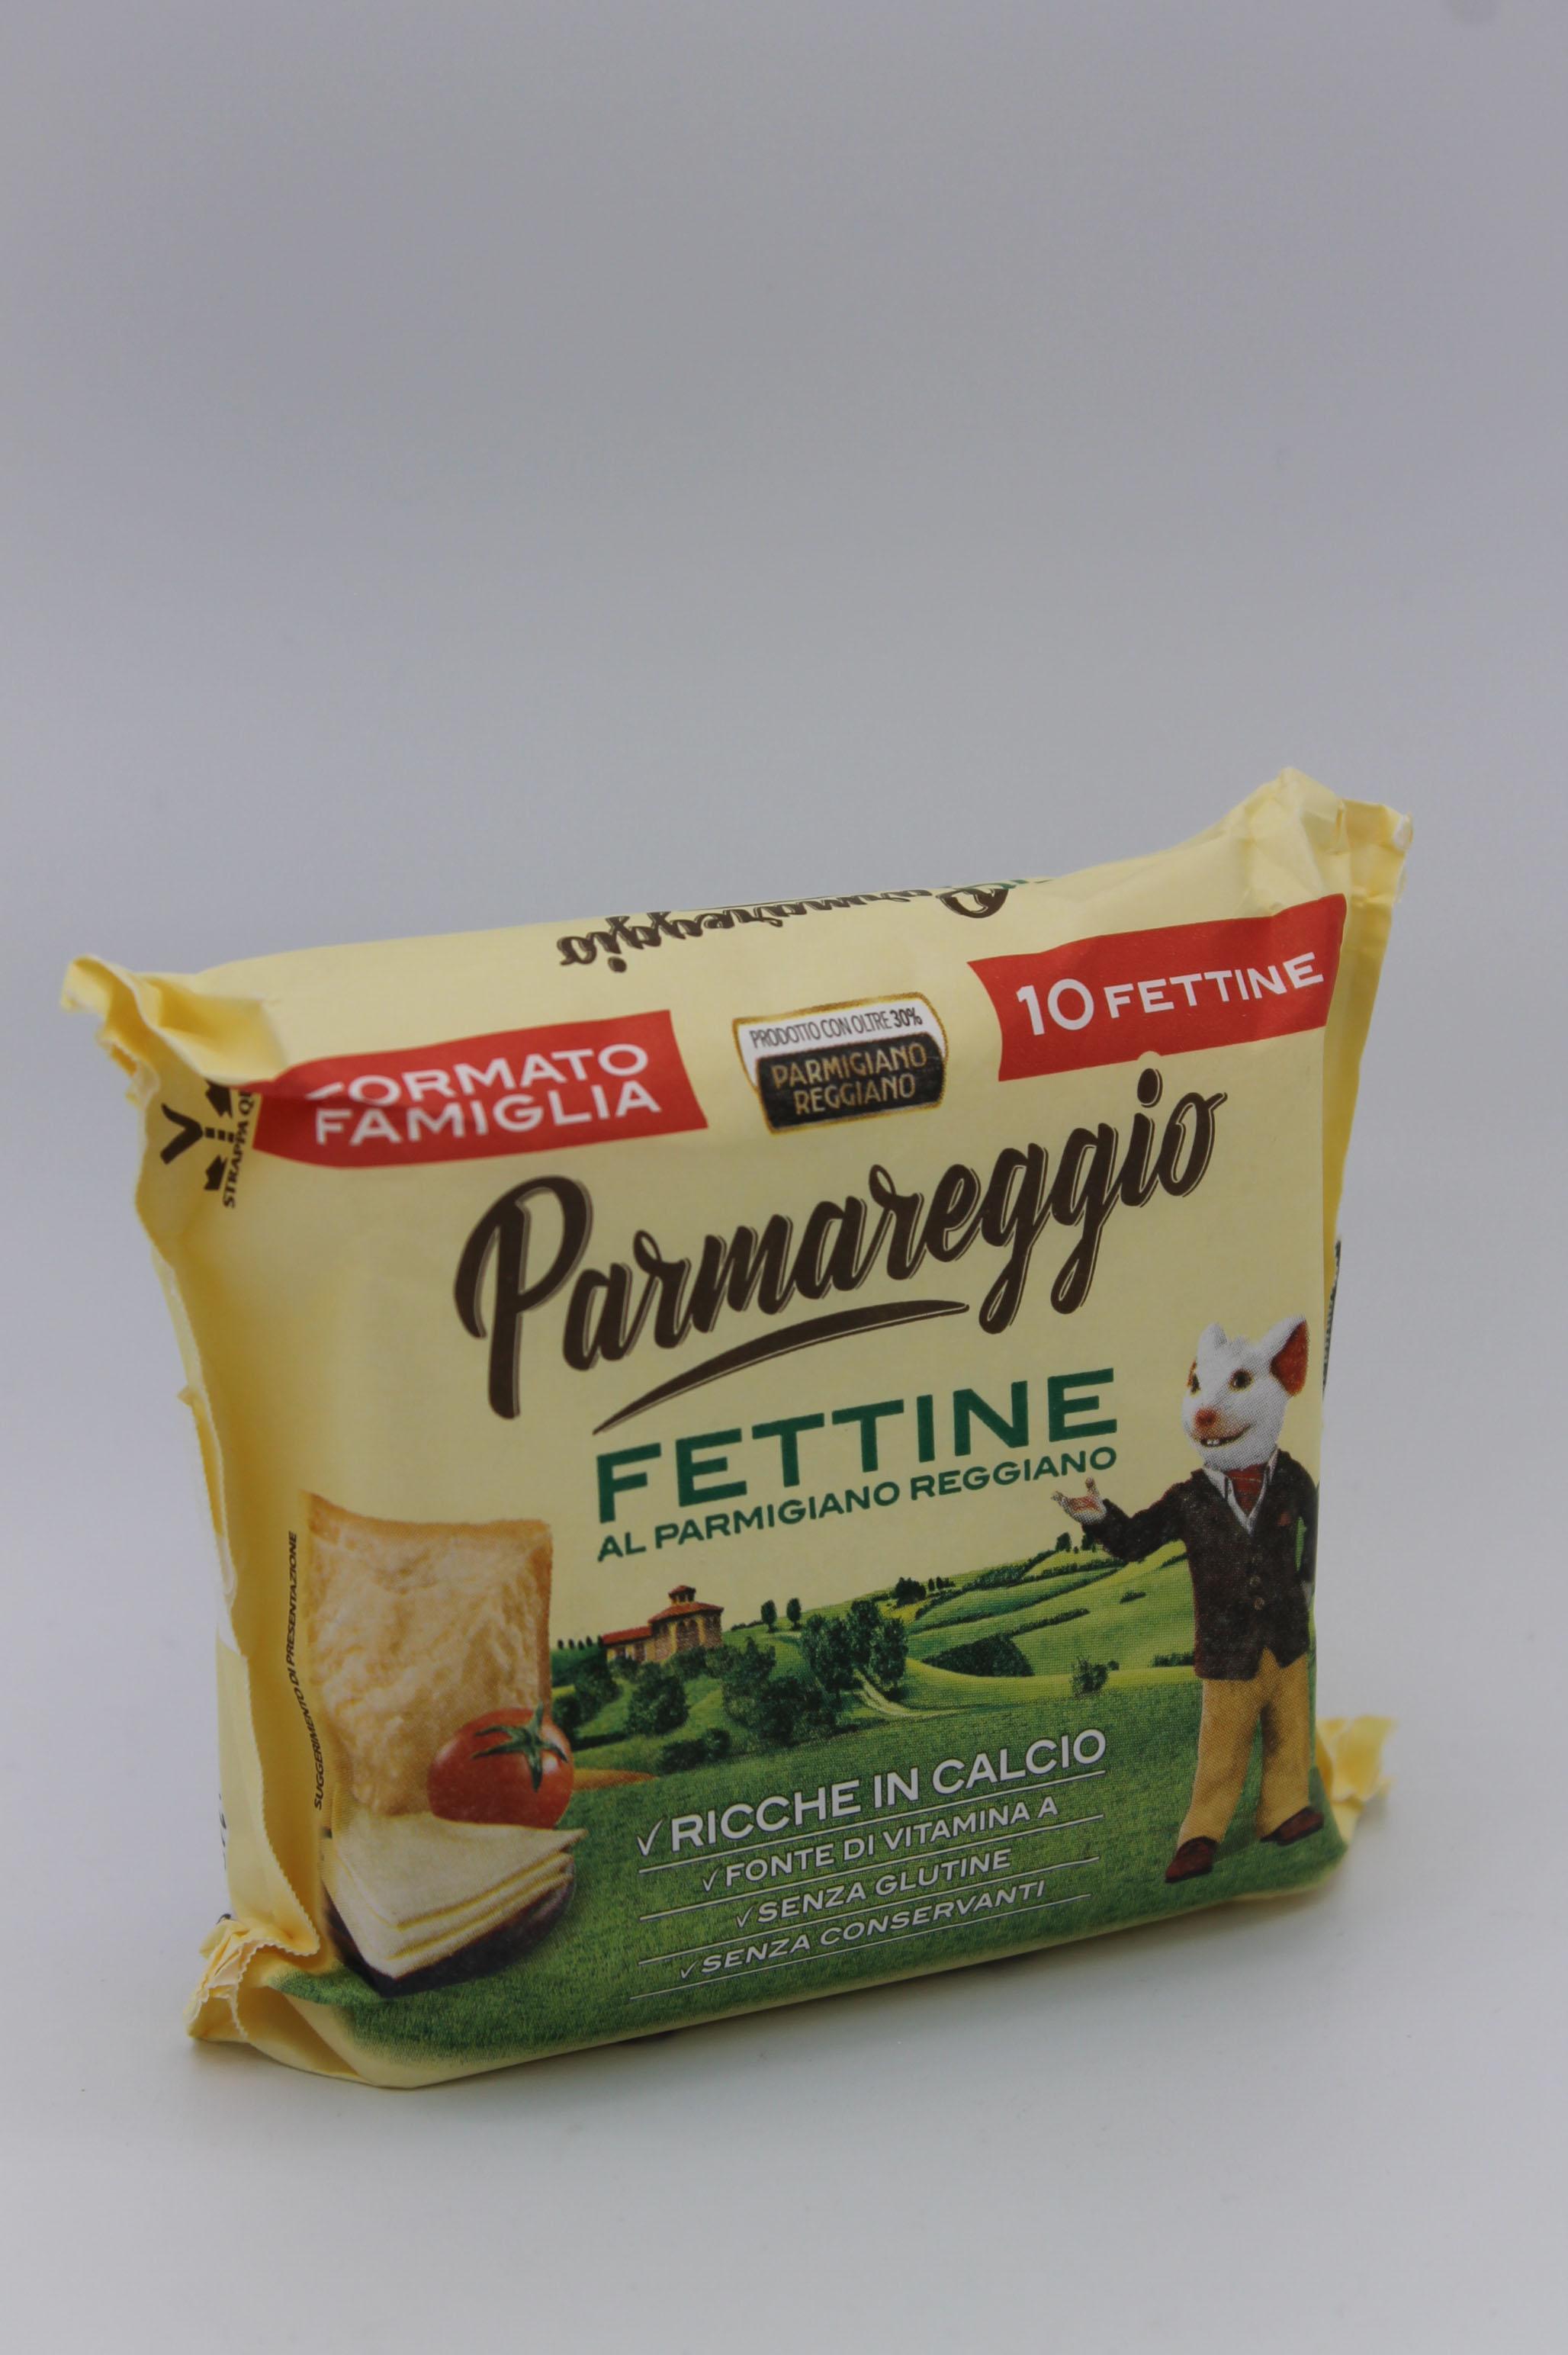 Parmareggio fettine al parmigiano reggiano 250gr.